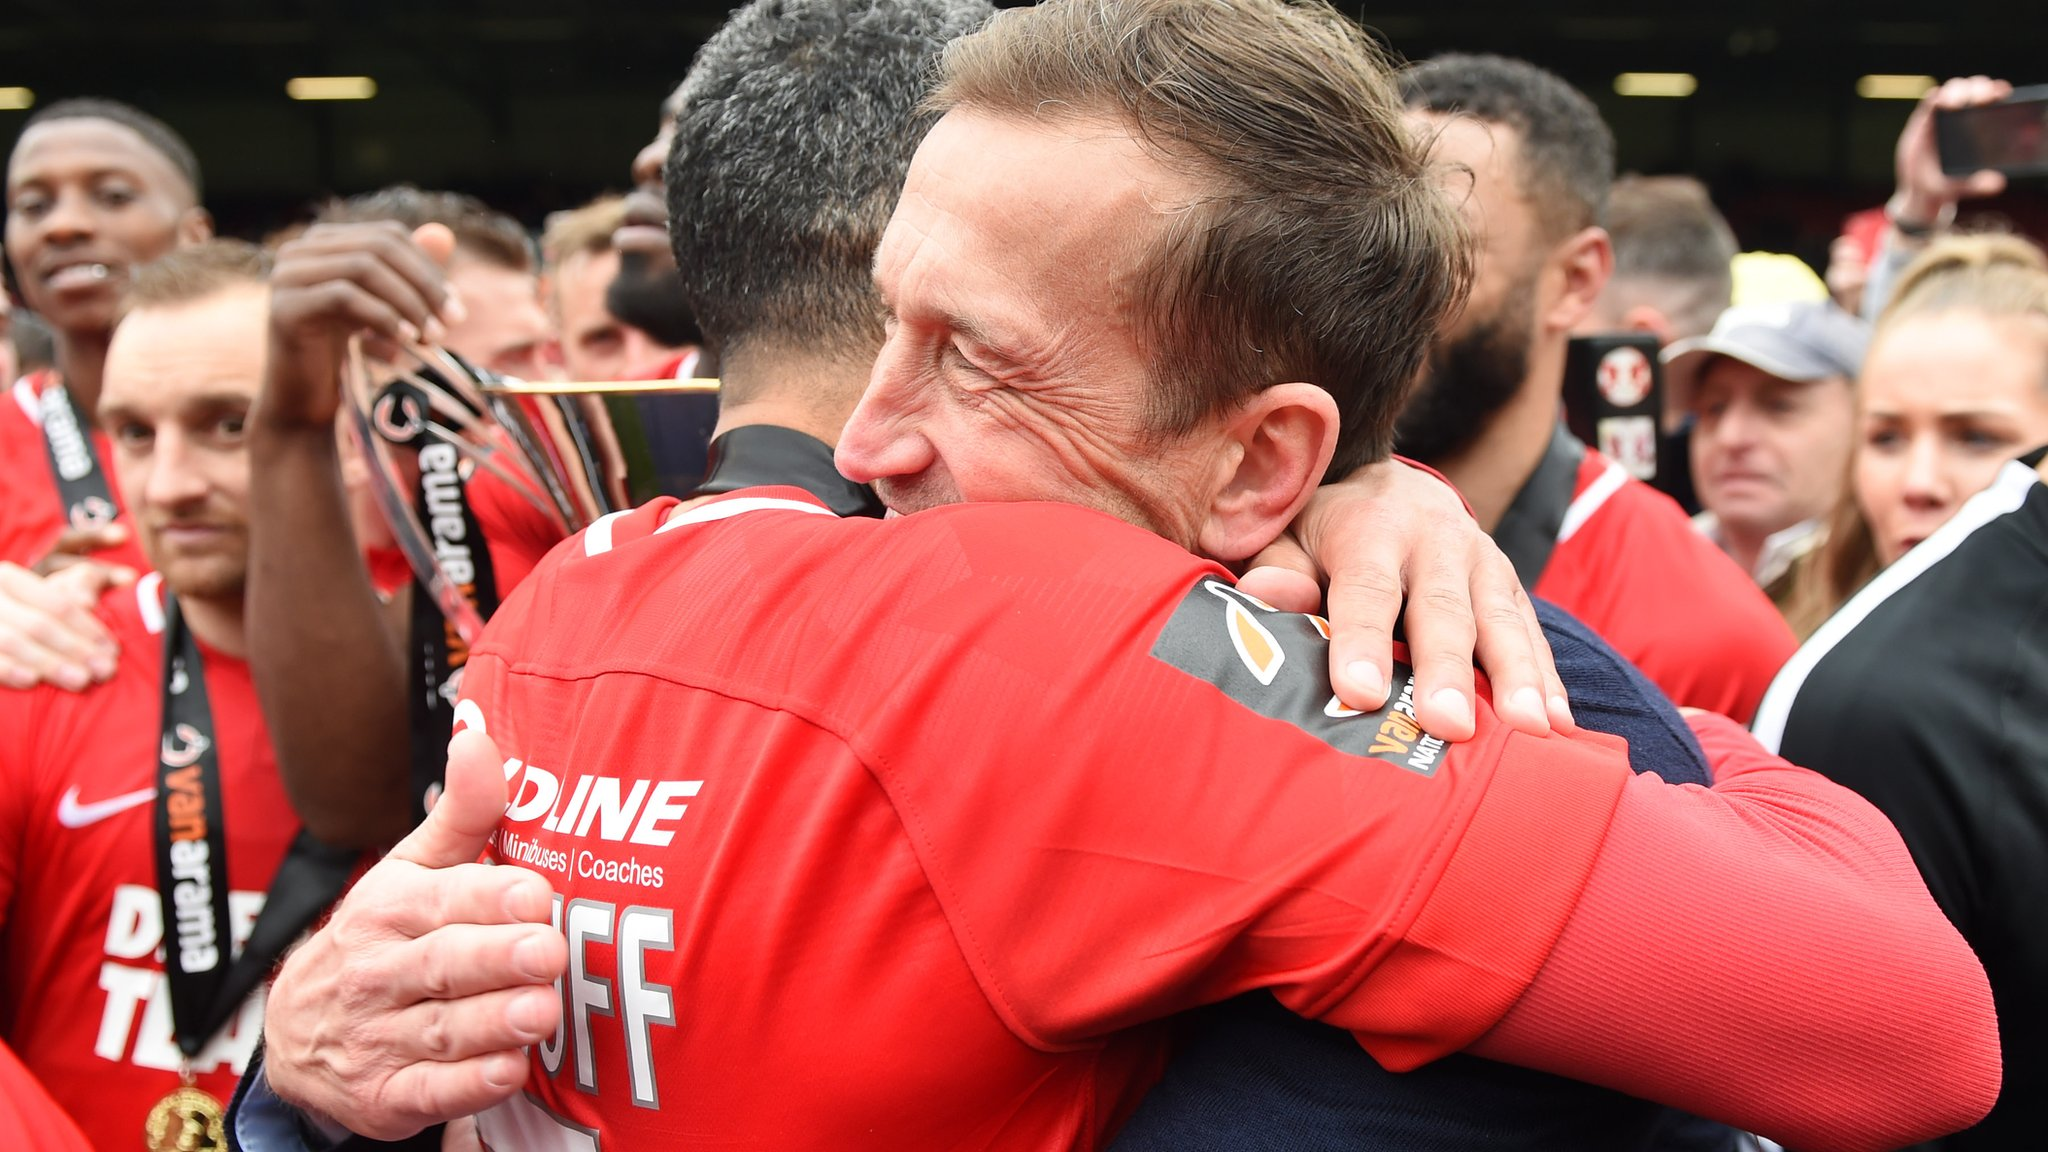 Justin Edinburgh: Leyton Orient plan to 'build on' late manager's coaching team